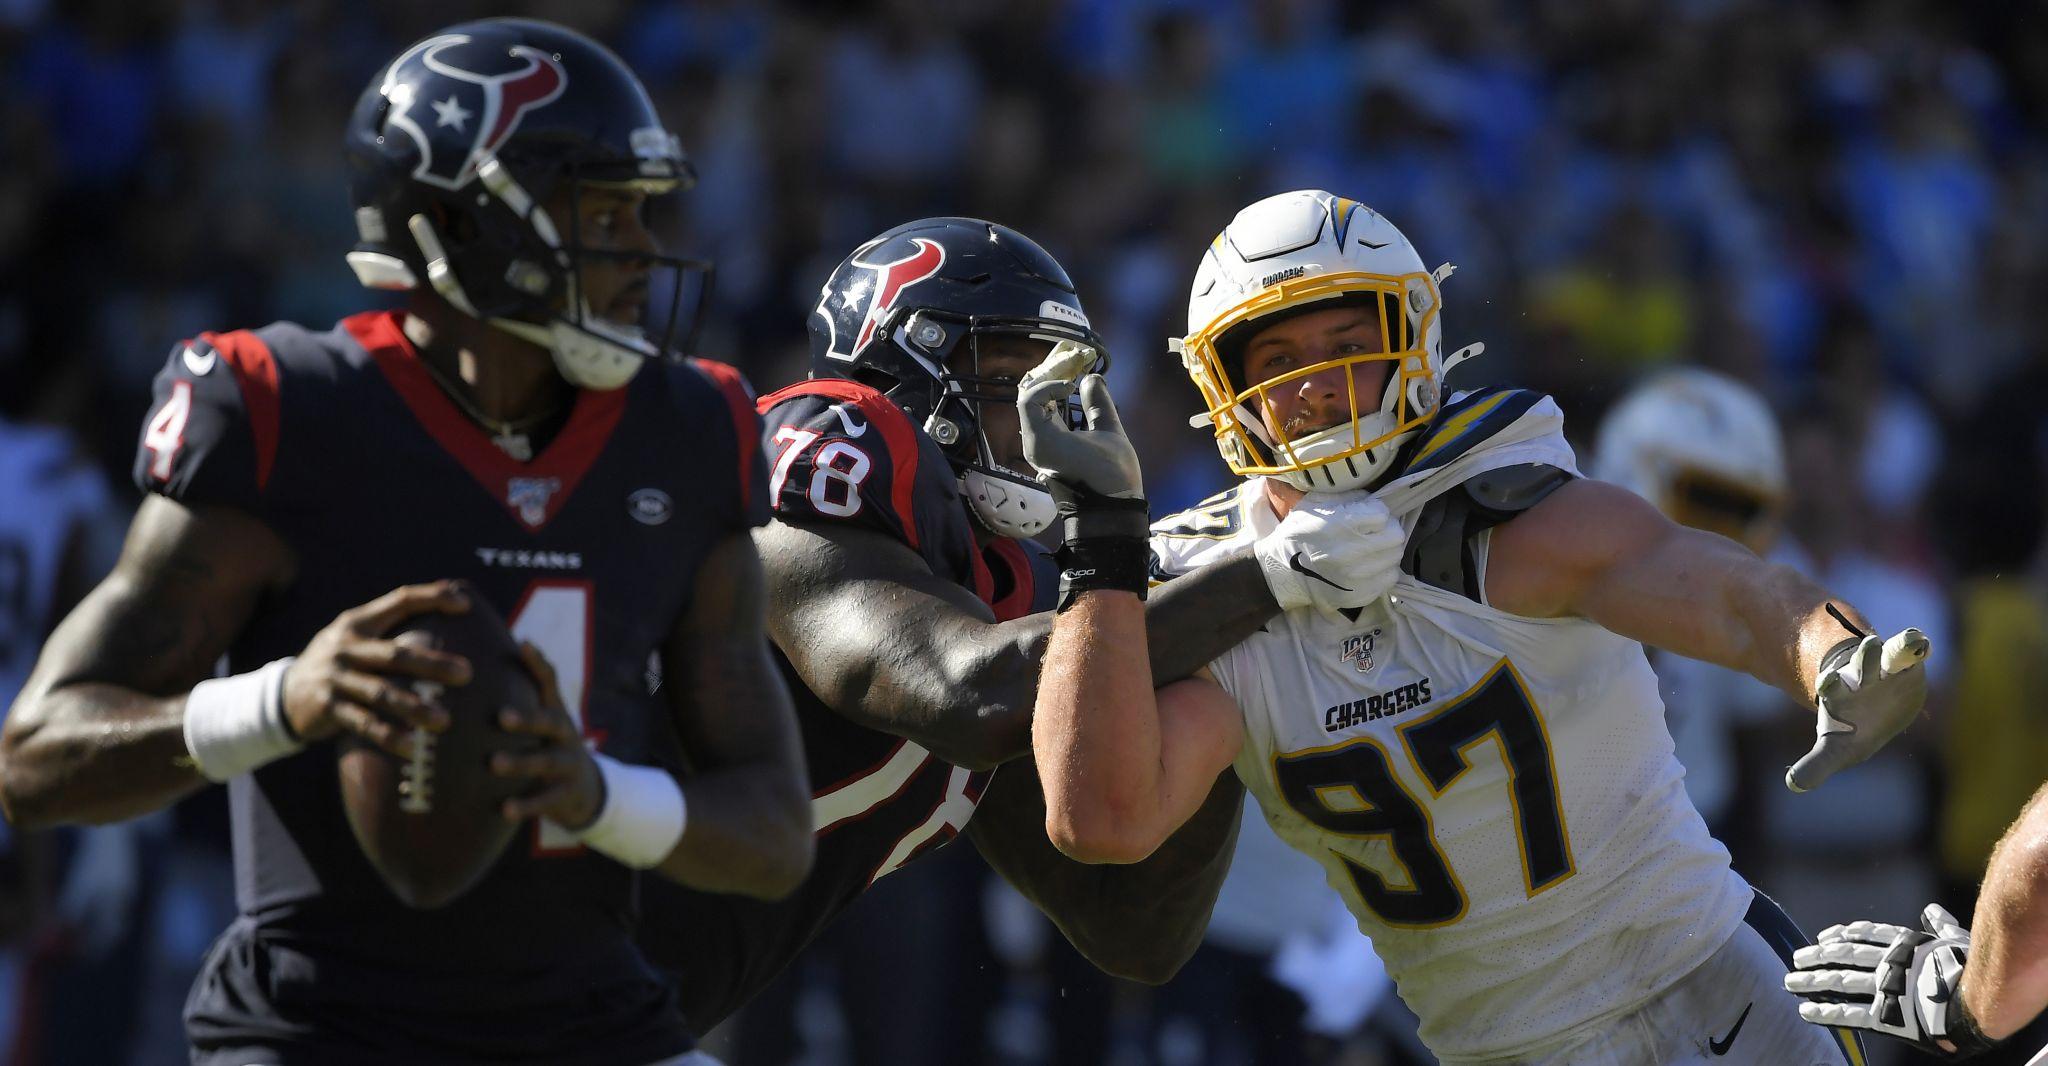 Texans' Laremy Tunsil on Deshaun Watson: 'Very respectful for a quarterback to take accountability'